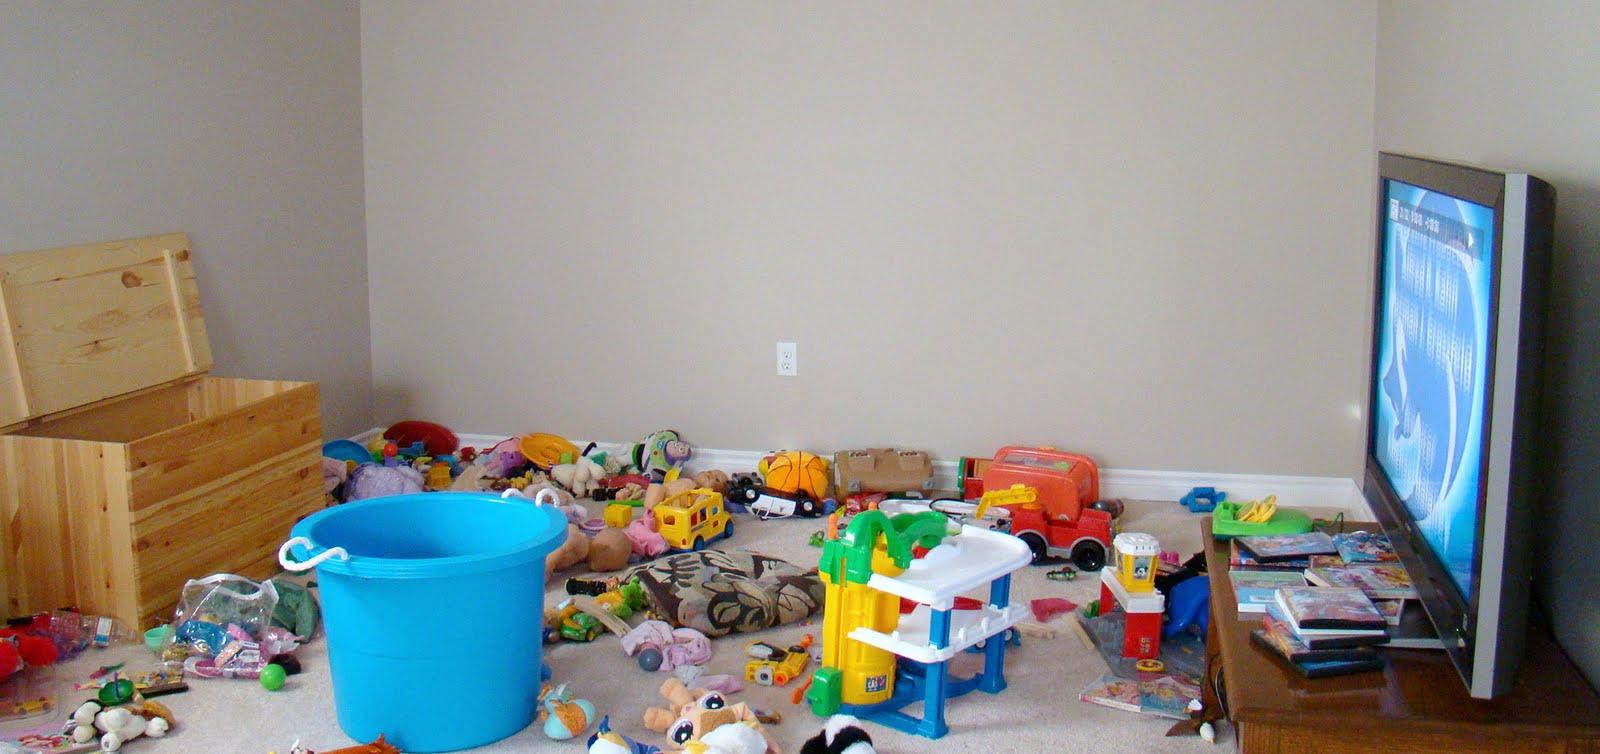 Toy Room Wentzell S Creative Designs Toy Room Rev